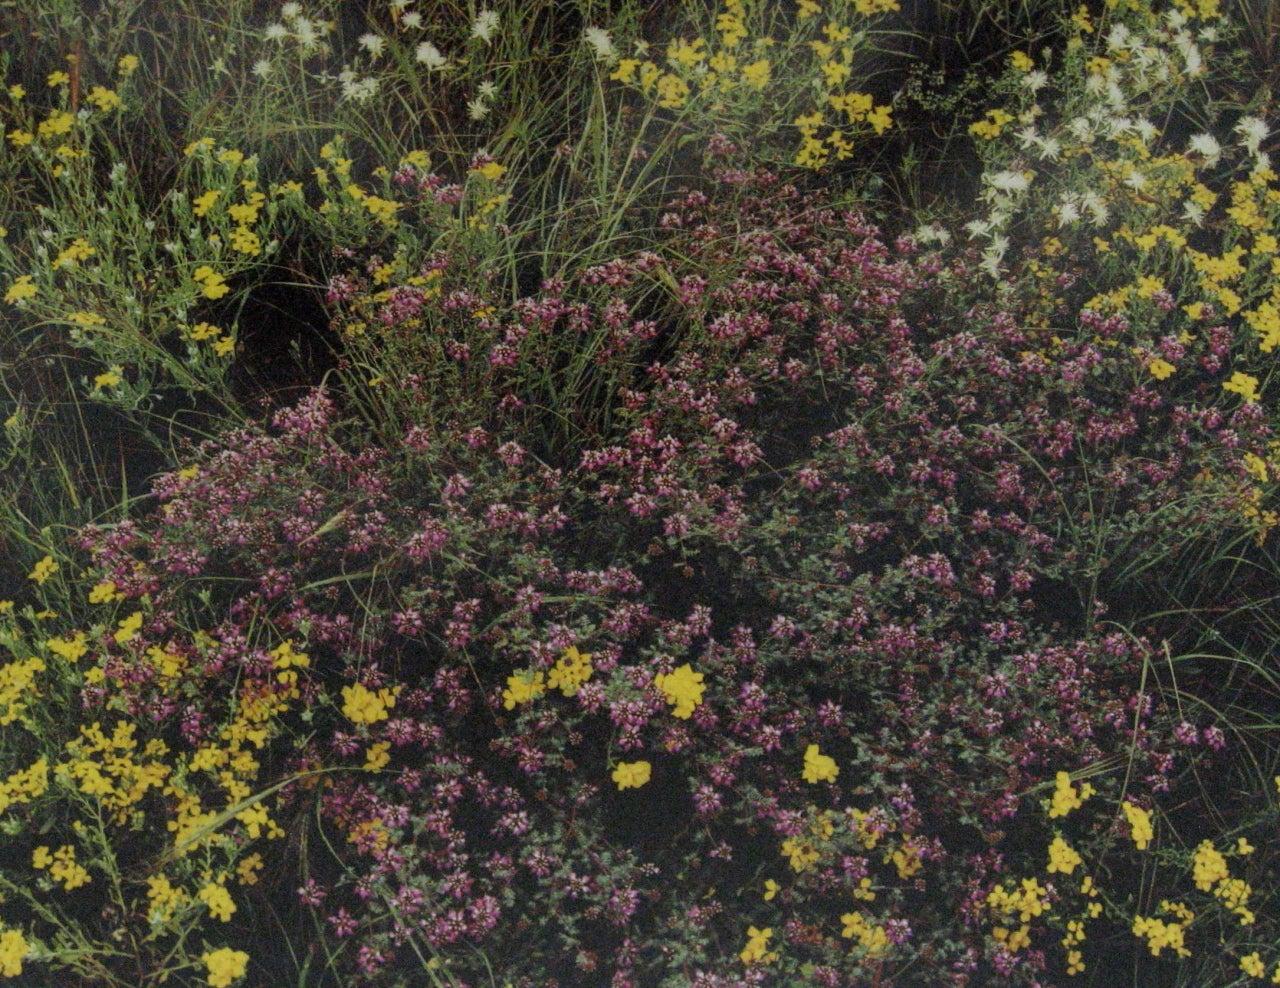 Purple Loco, Yellow Paper Daisy, White Dematis, Davis, Mountains, Texas